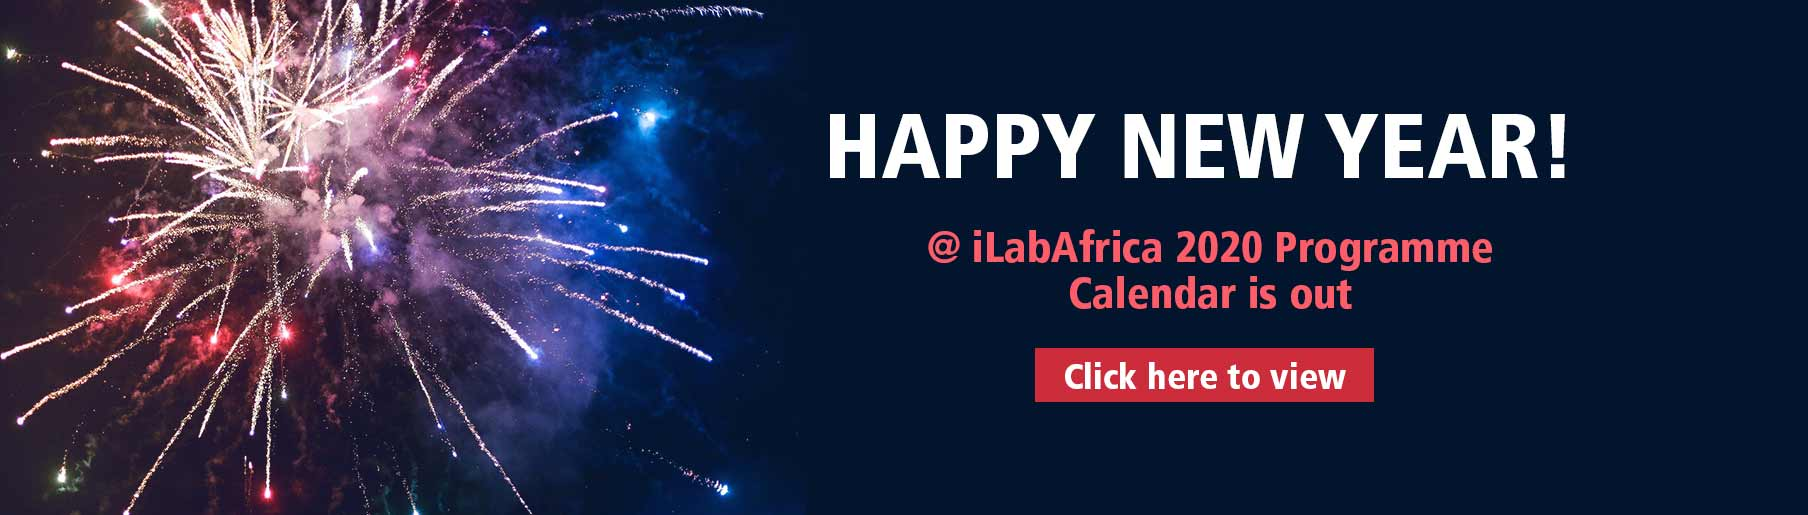 ilabafrica2020programme-1